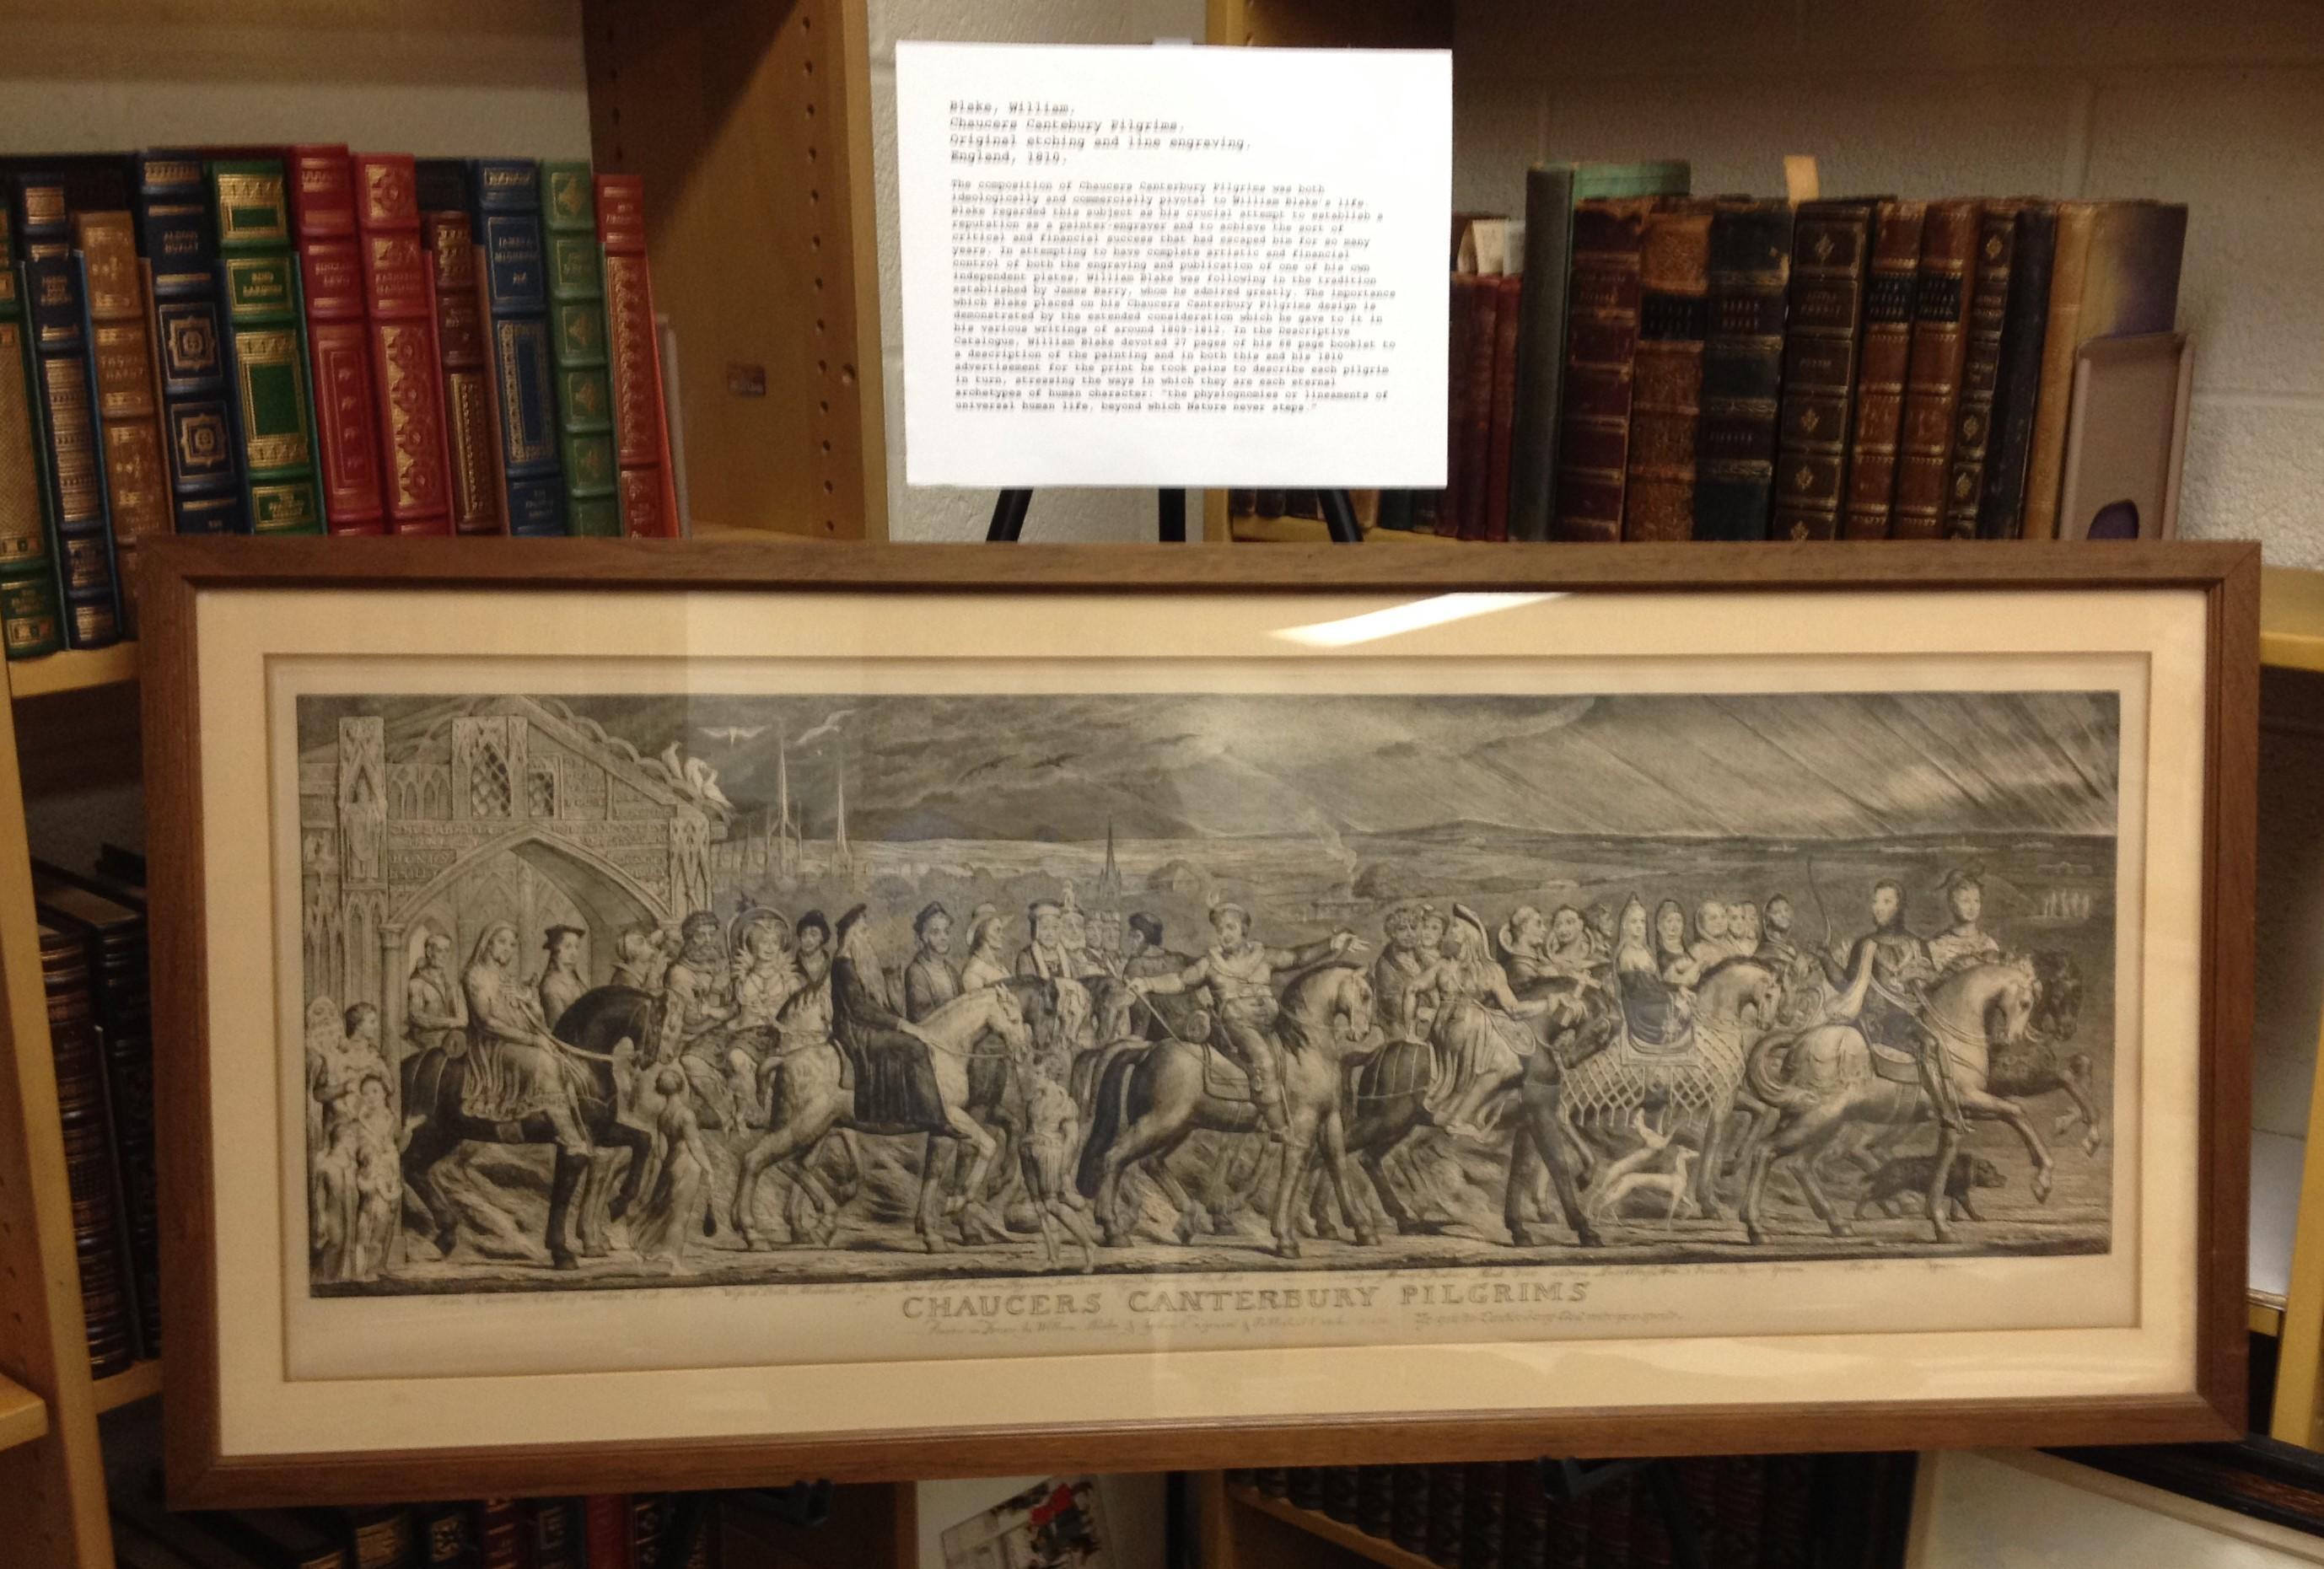 William Blake. Chaucer's Pilgrims. print. 1810.